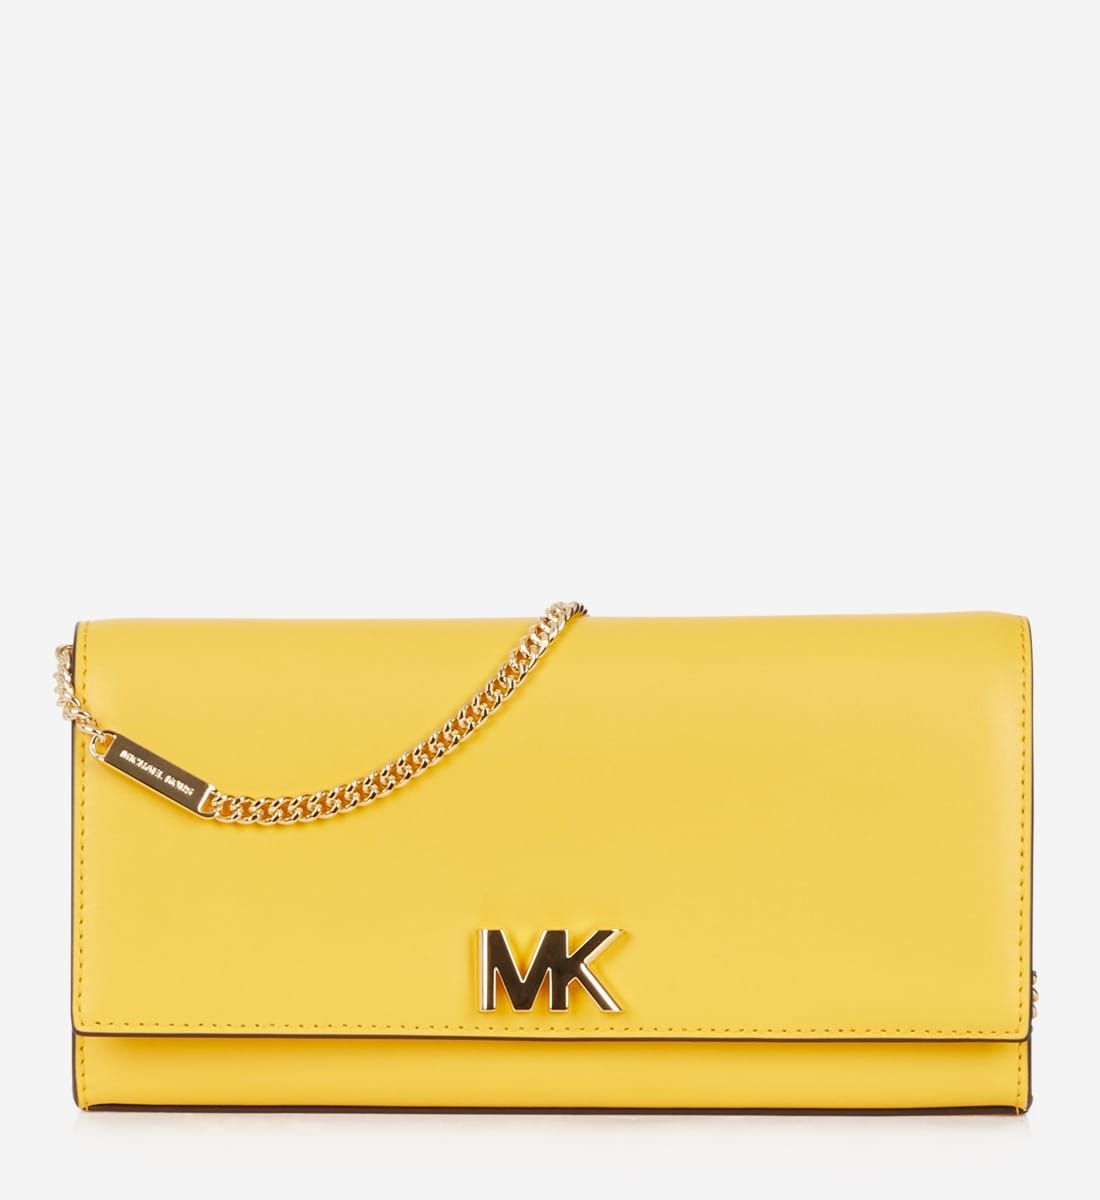 Sac pochette Mott en cuir Michael Michael Kors jaune - Galeries ...